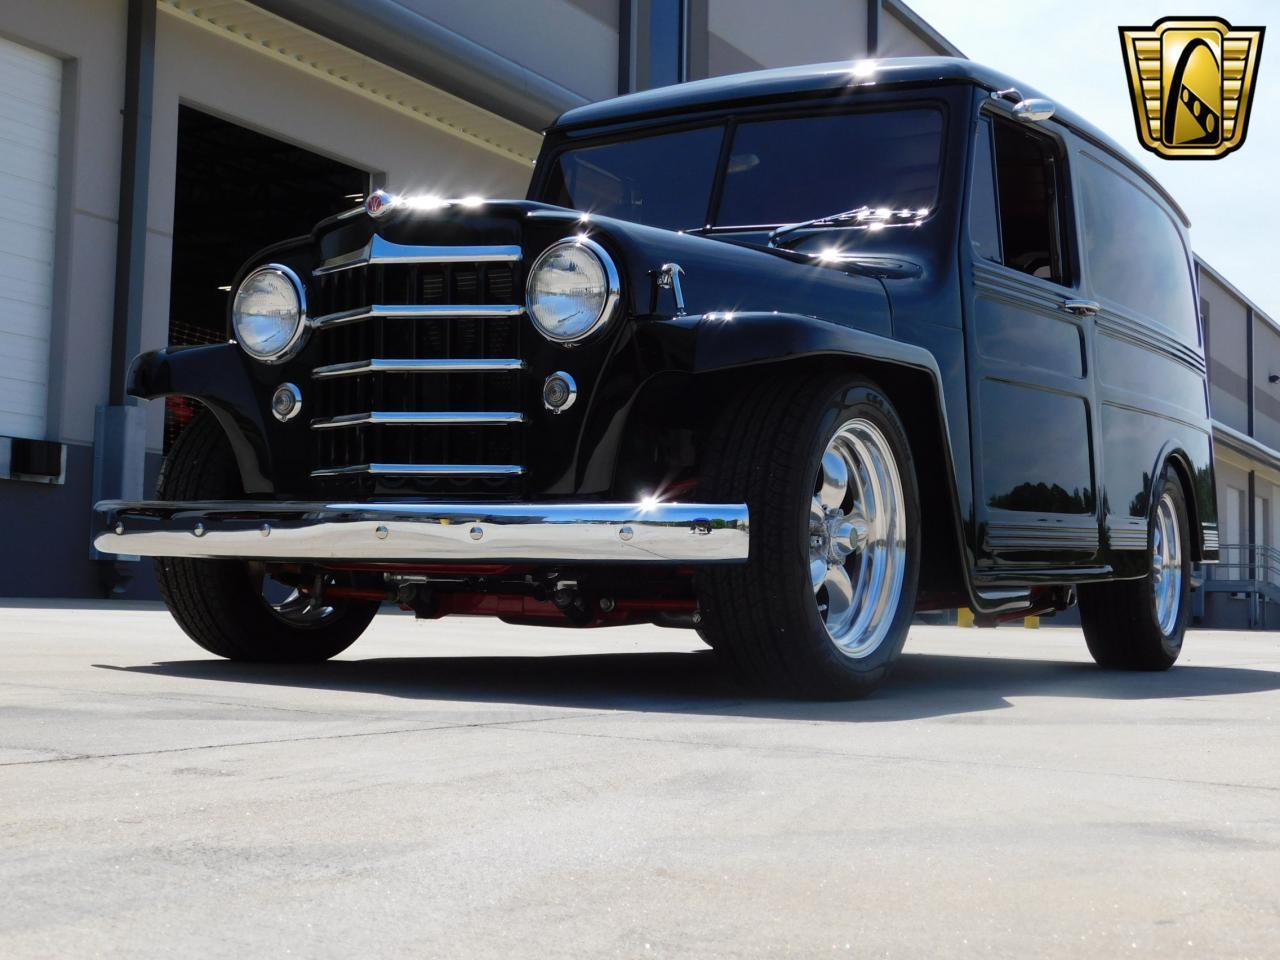 Large Picture of '52 Sedan located in Alpharetta Georgia - $58,000.00 Offered by Gateway Classic Cars - Atlanta - L8EZ